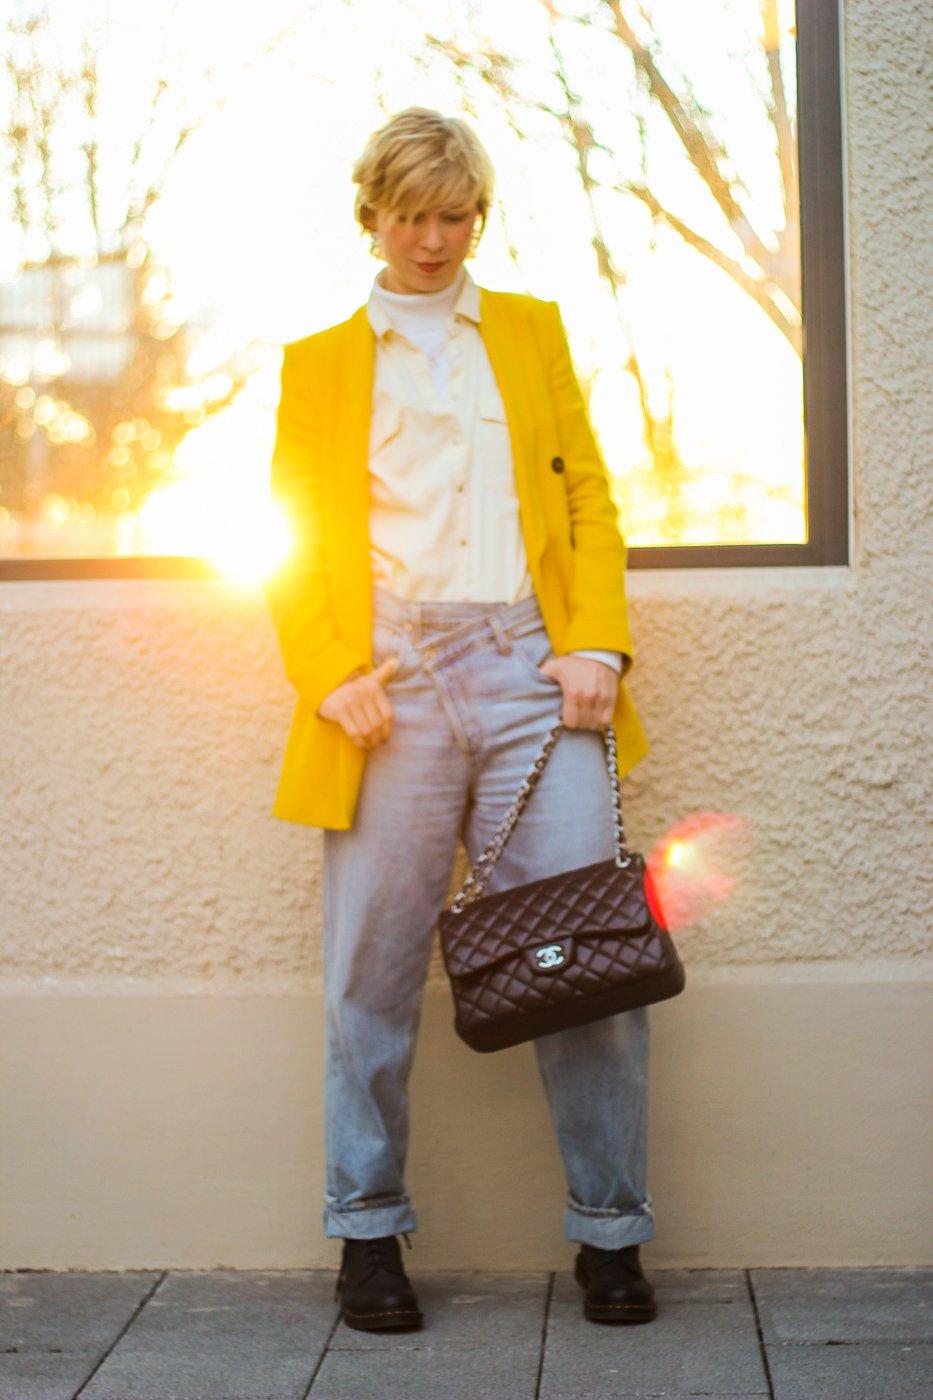 conny doll lifestyle: Criss Cross Jeans - der Denimtrend im Frühling ist schräg, gelber Blazer, Frühlingslook, Doc Martens, Denim, casual, lässiges Styling